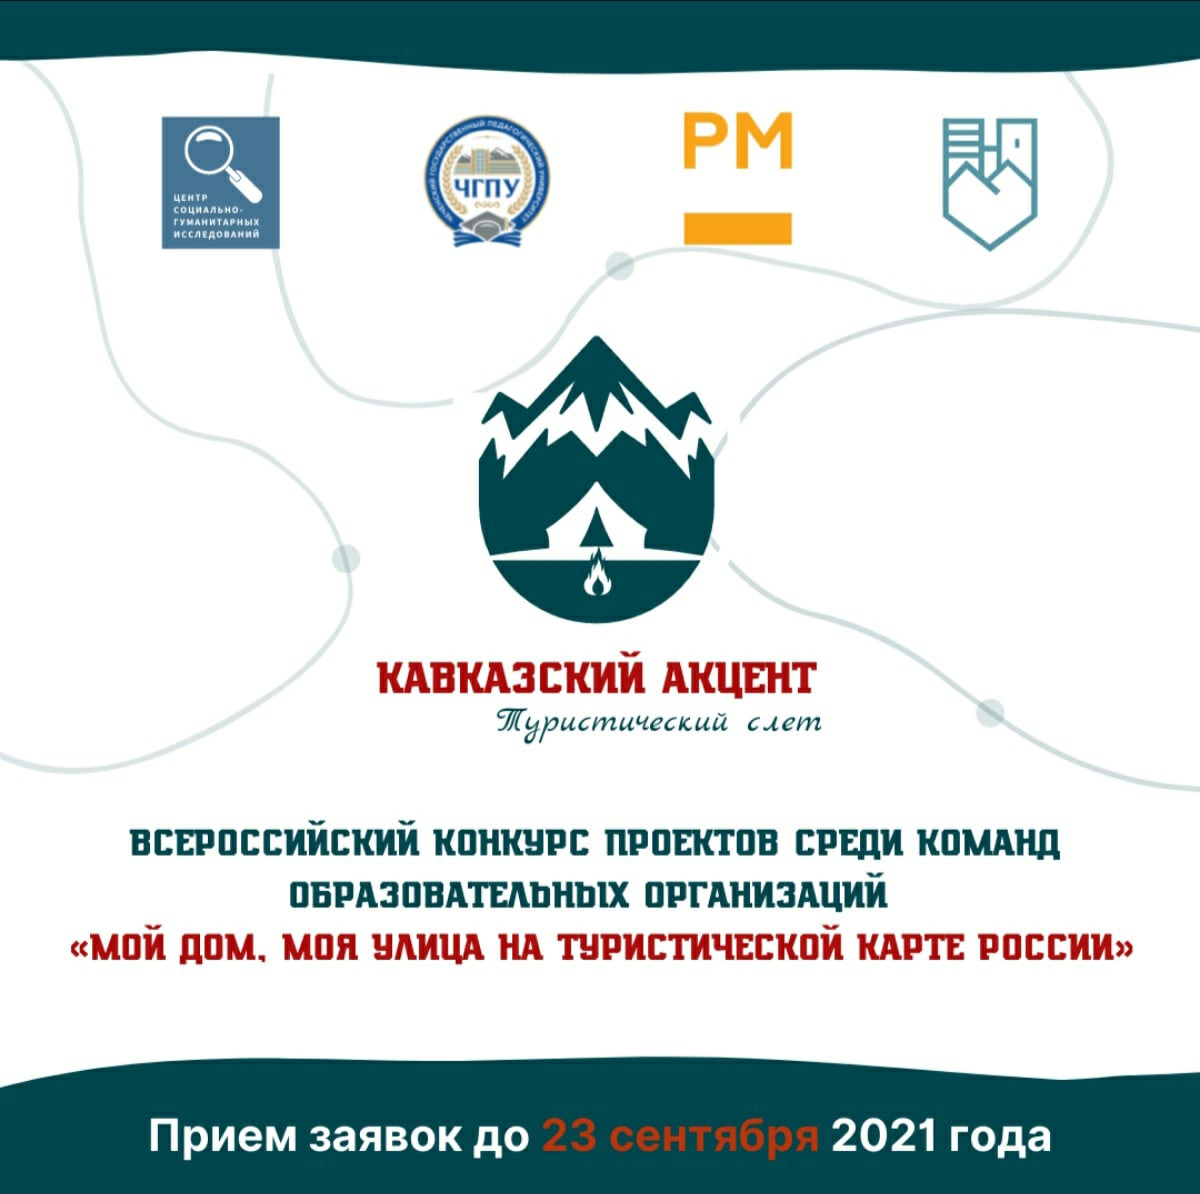 КАВКАЗСКИЙ АКЦЕНТ